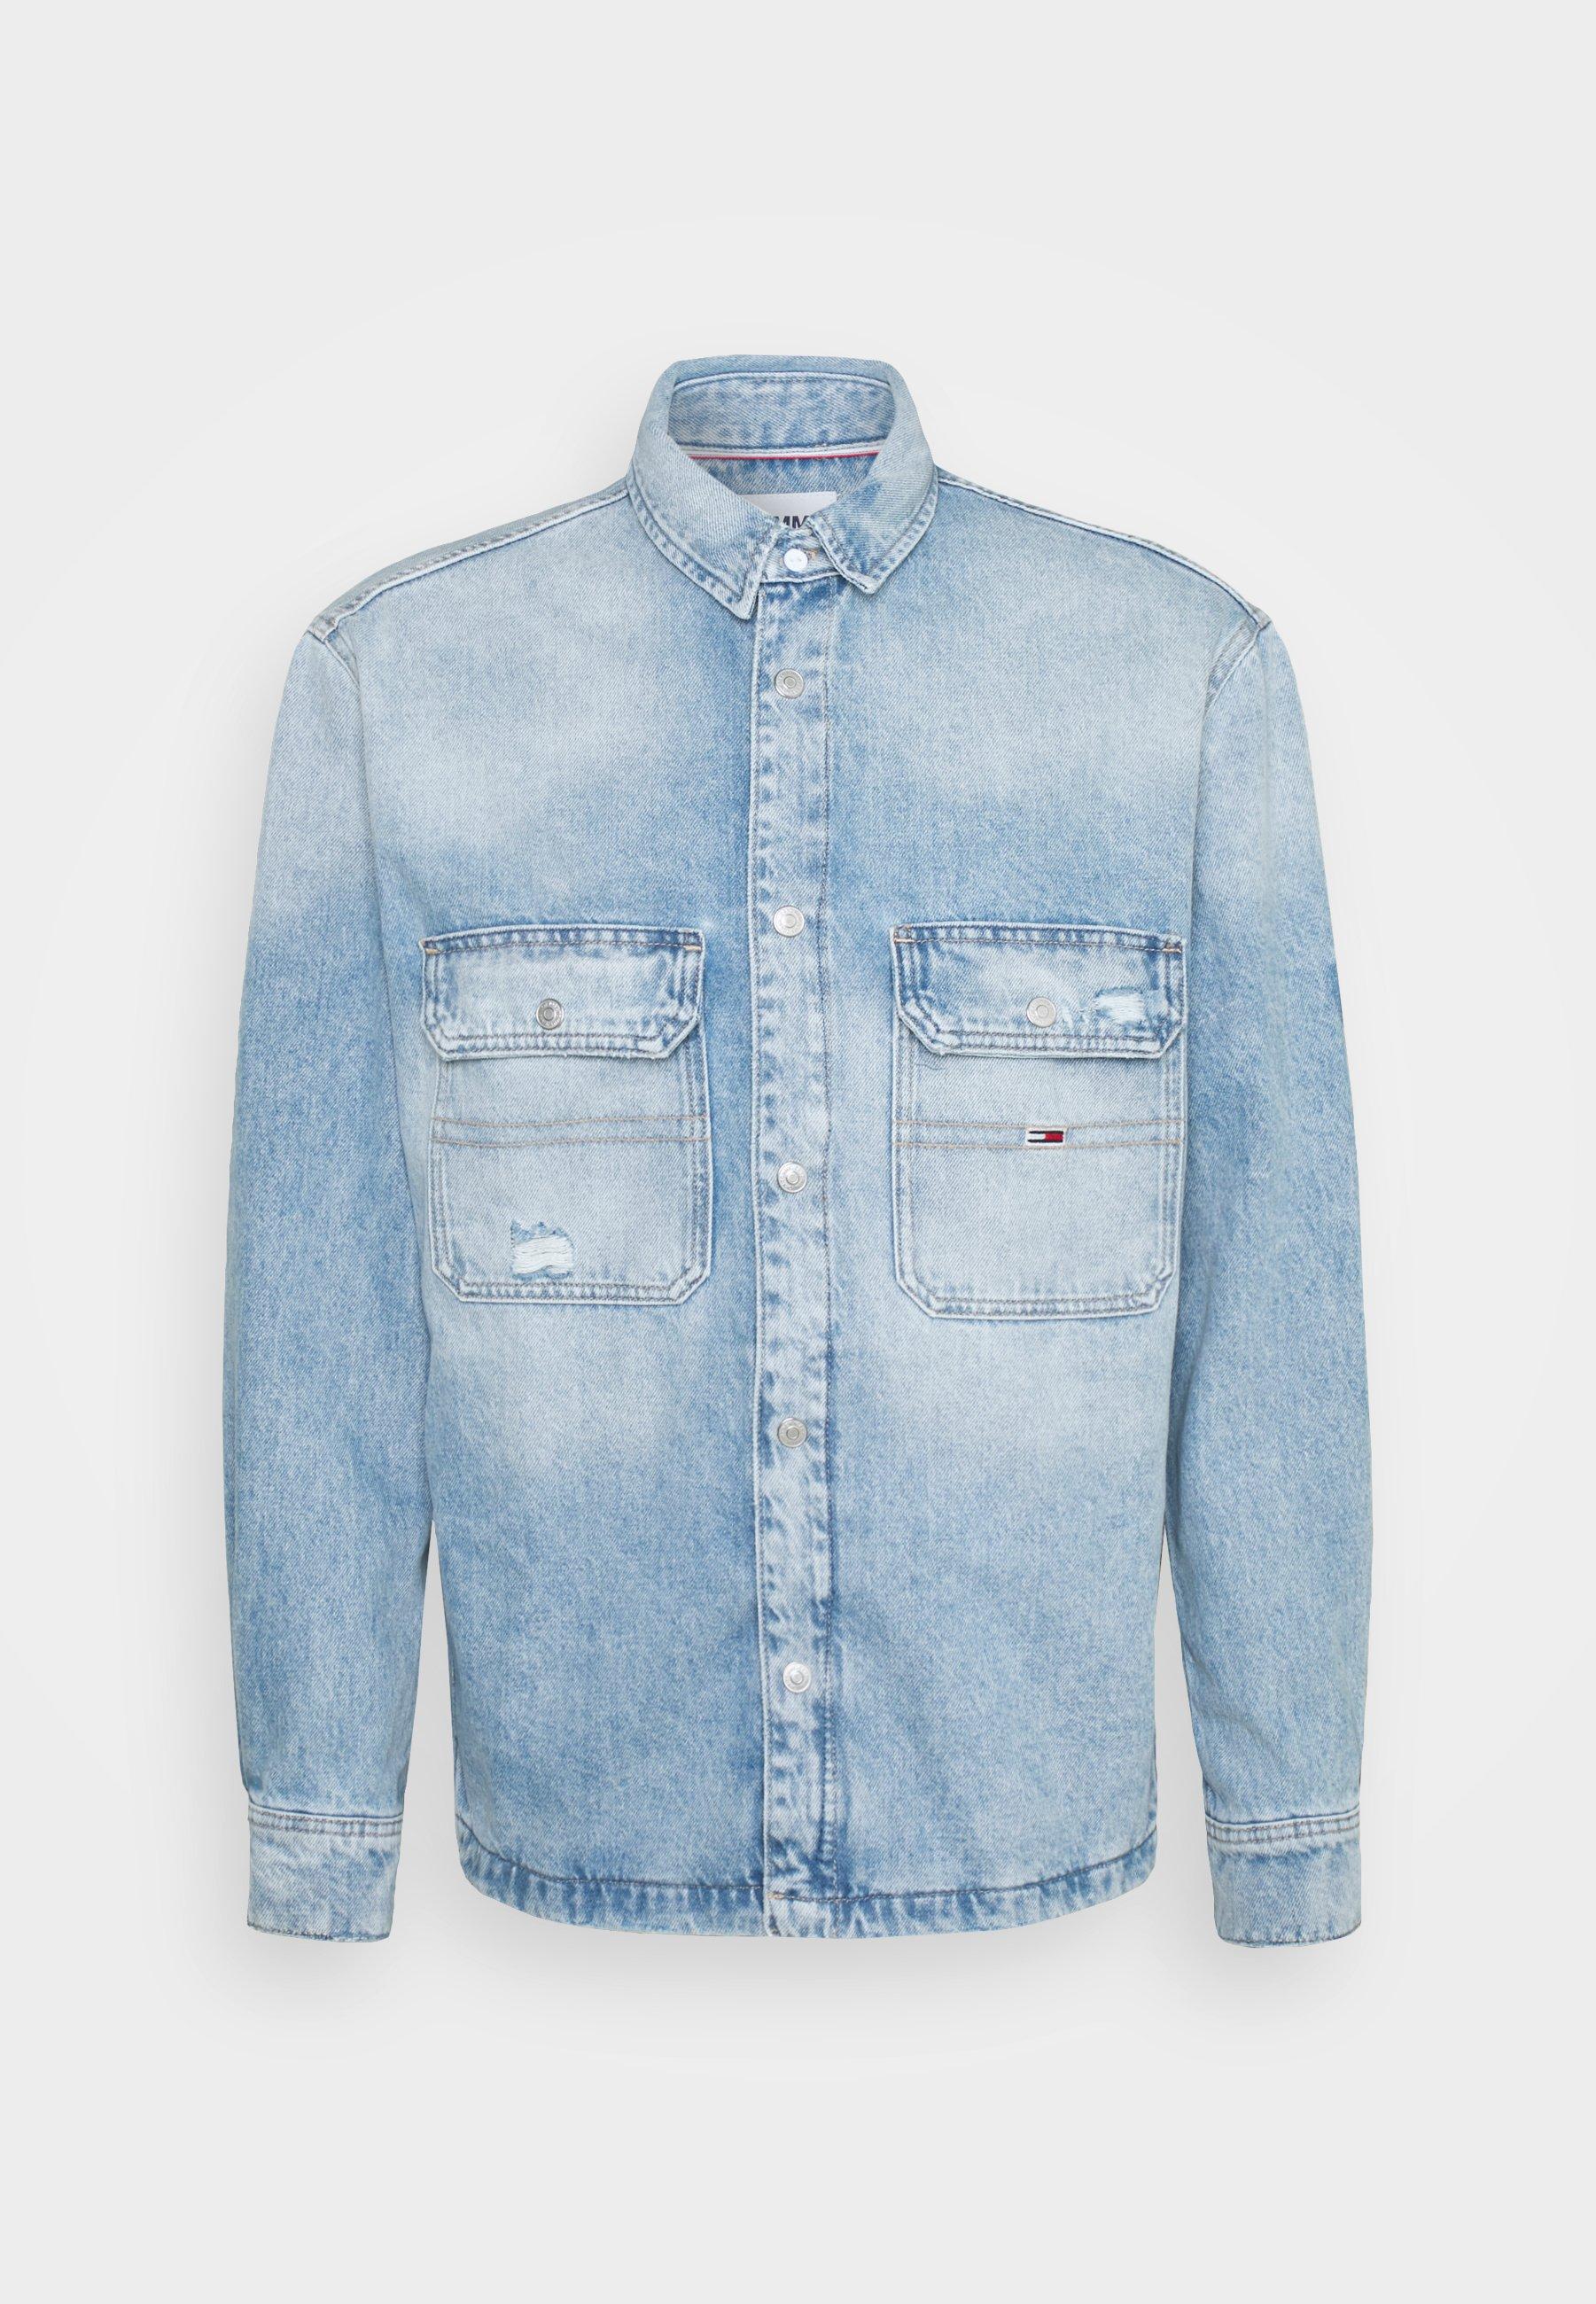 Homme WORKER SHIRT JACKET UNISEX - Veste en jean